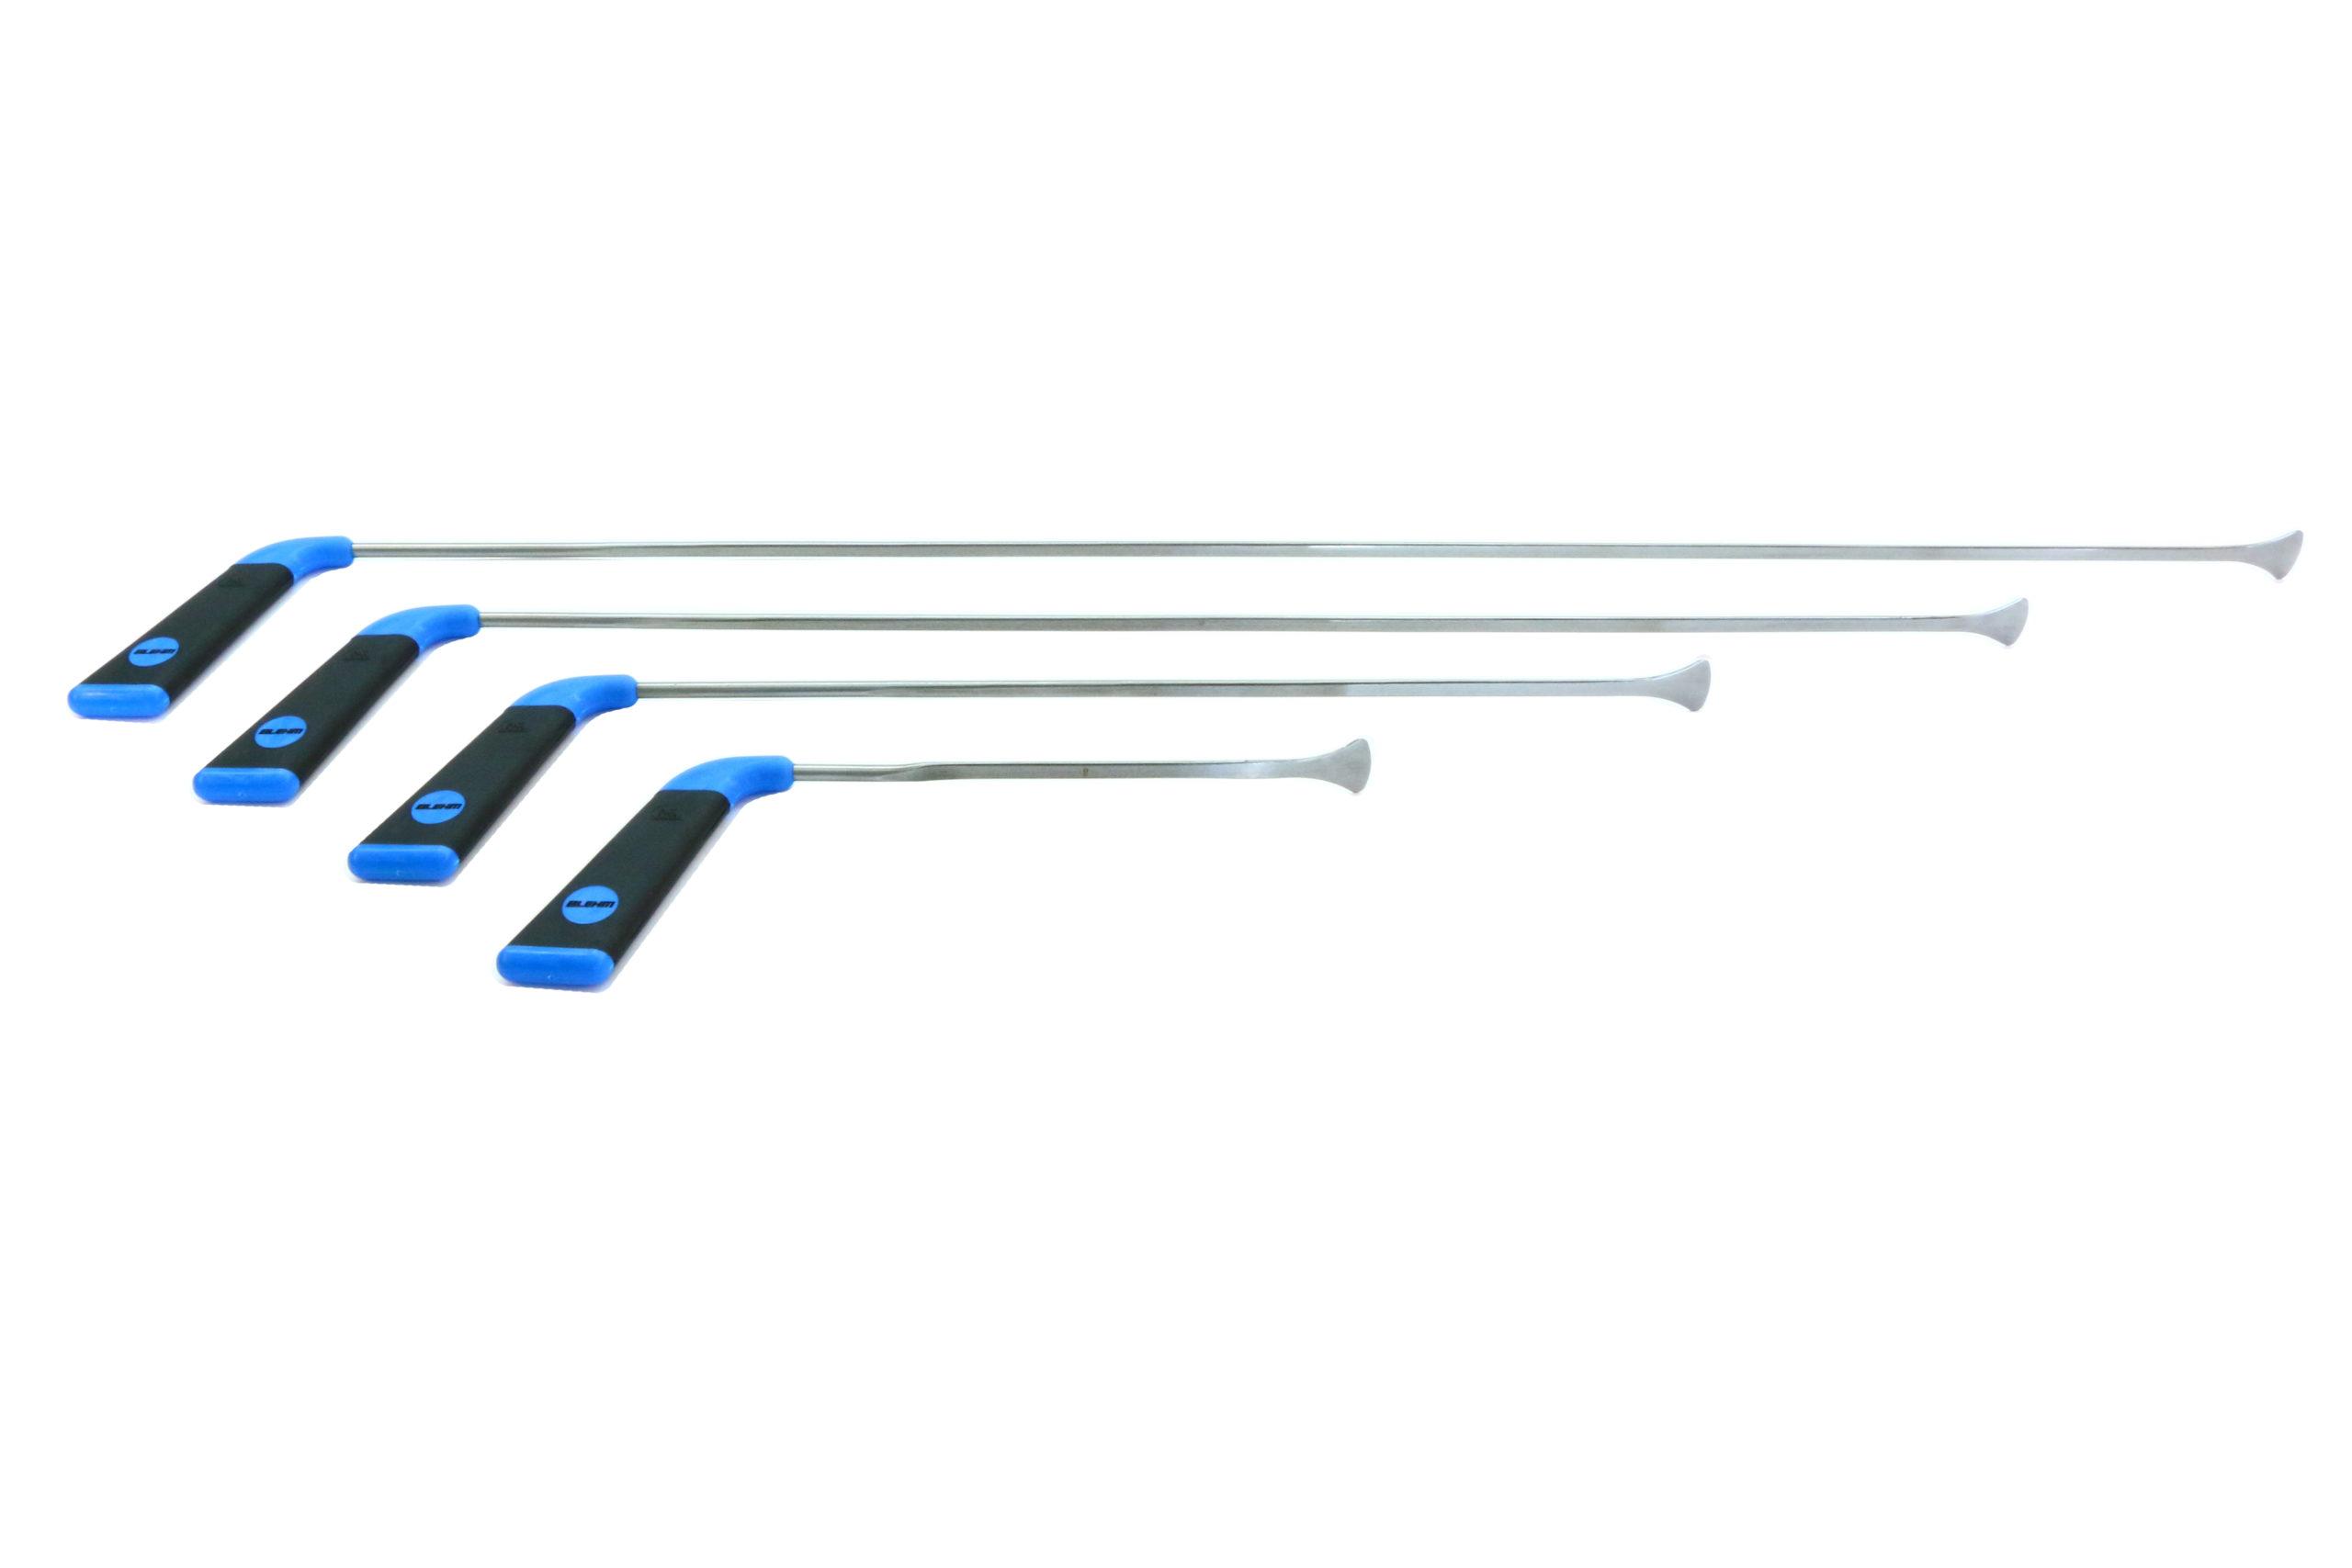 Blehm Whail Tail Tools - 4 Piece Set